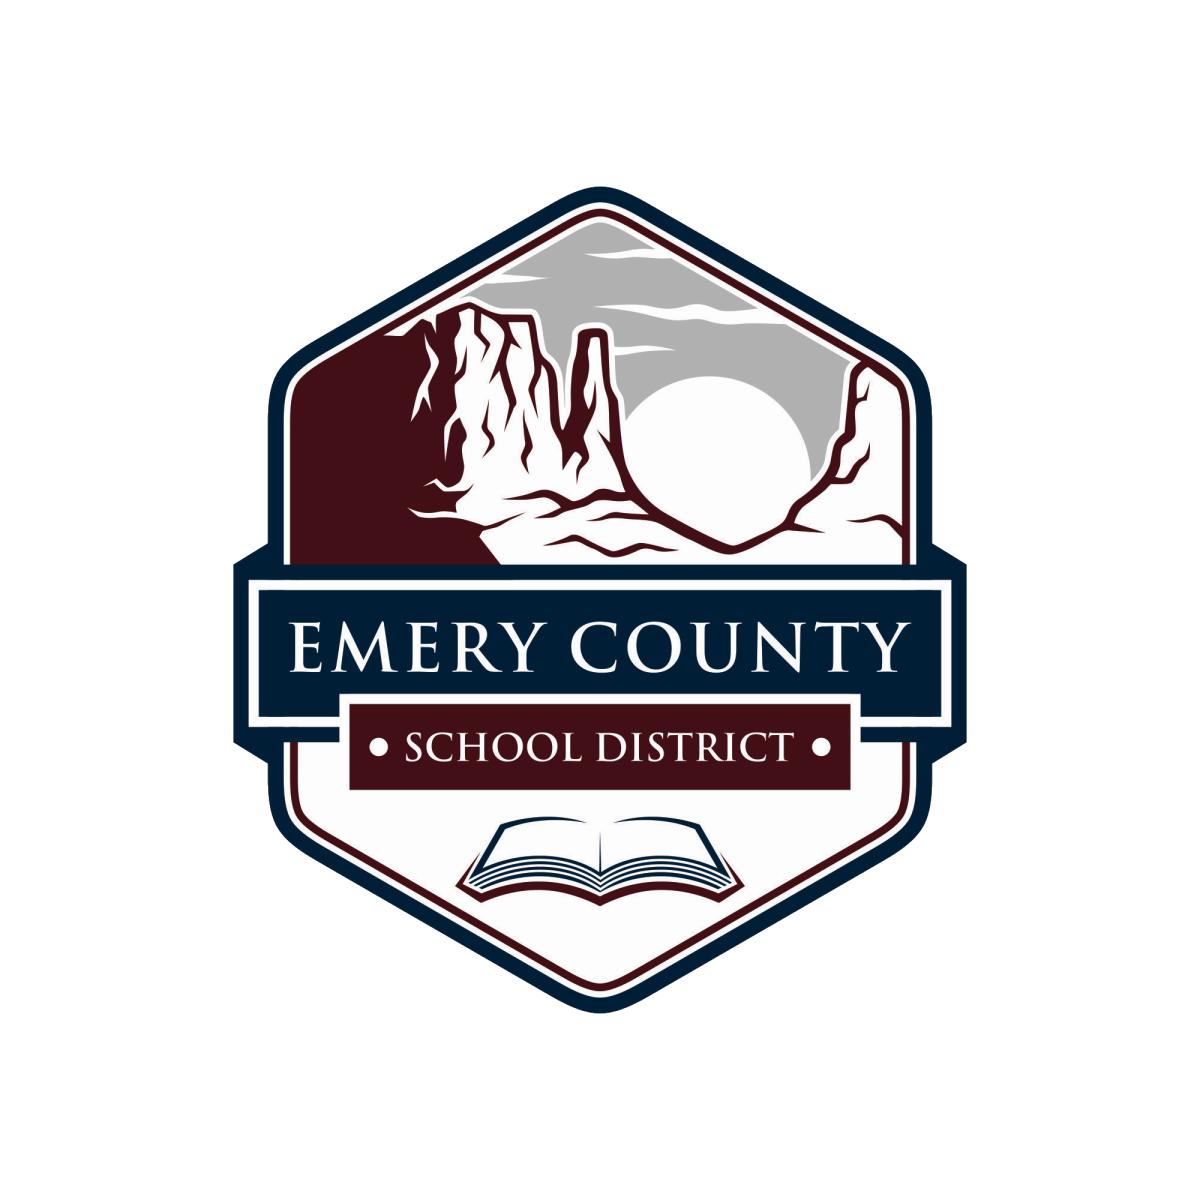 Emery-County-revJB.png